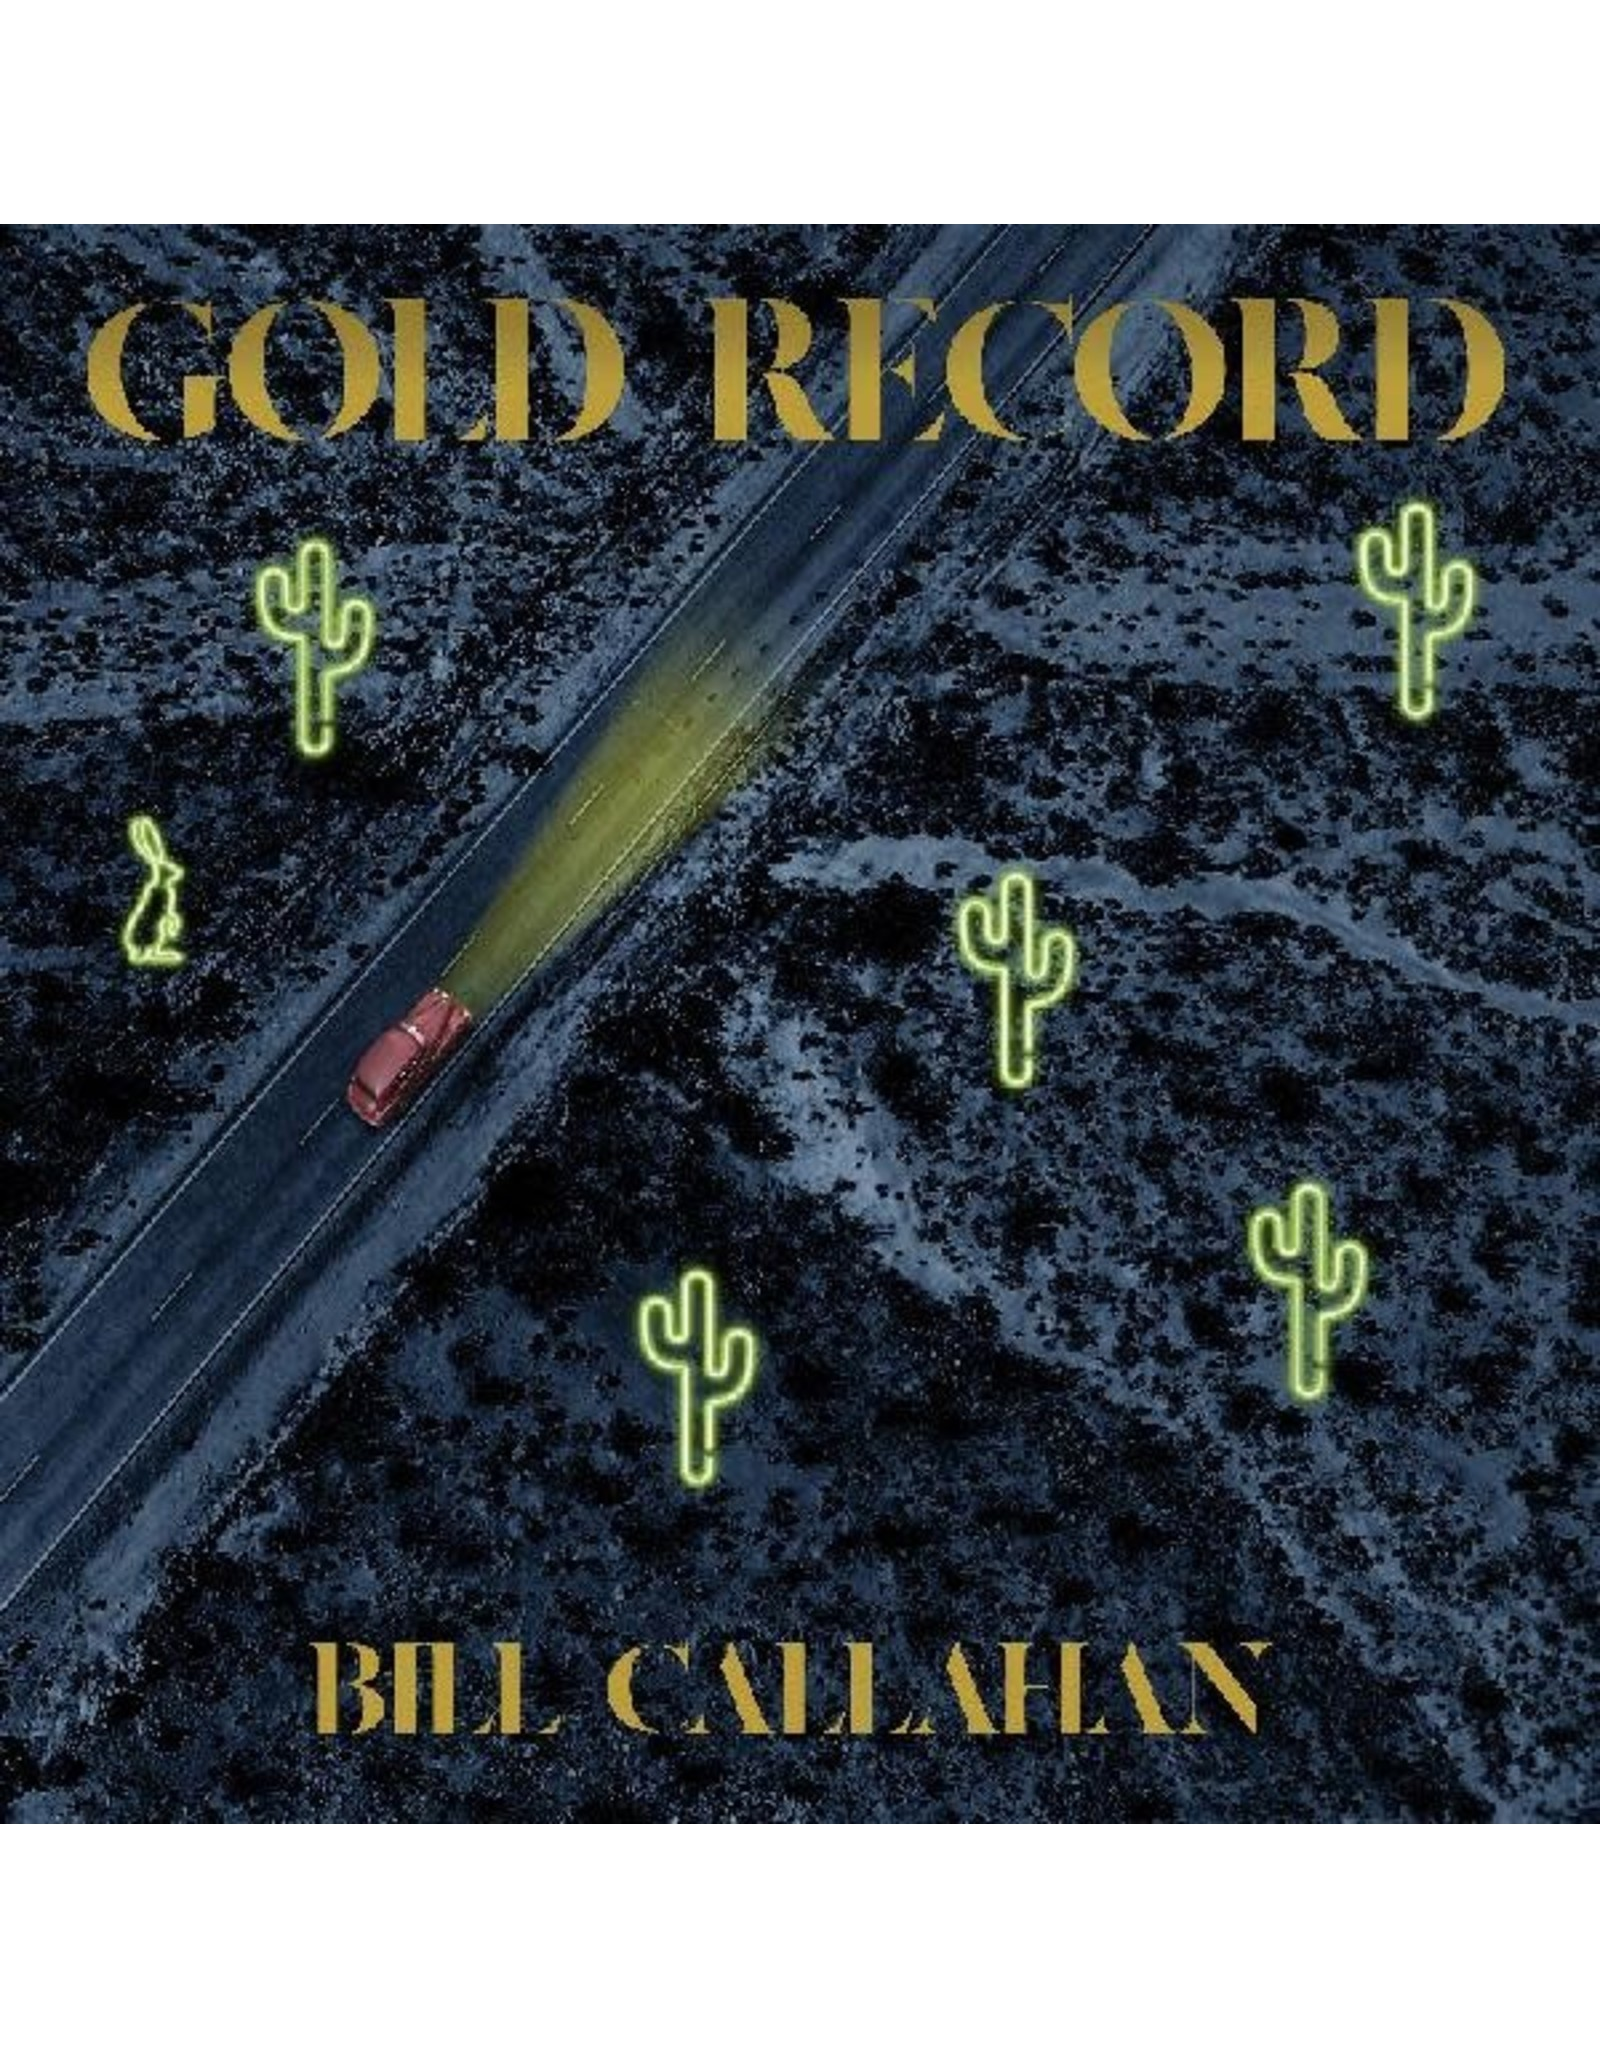 New Vinyl Bill Callahan - Gold Record LP